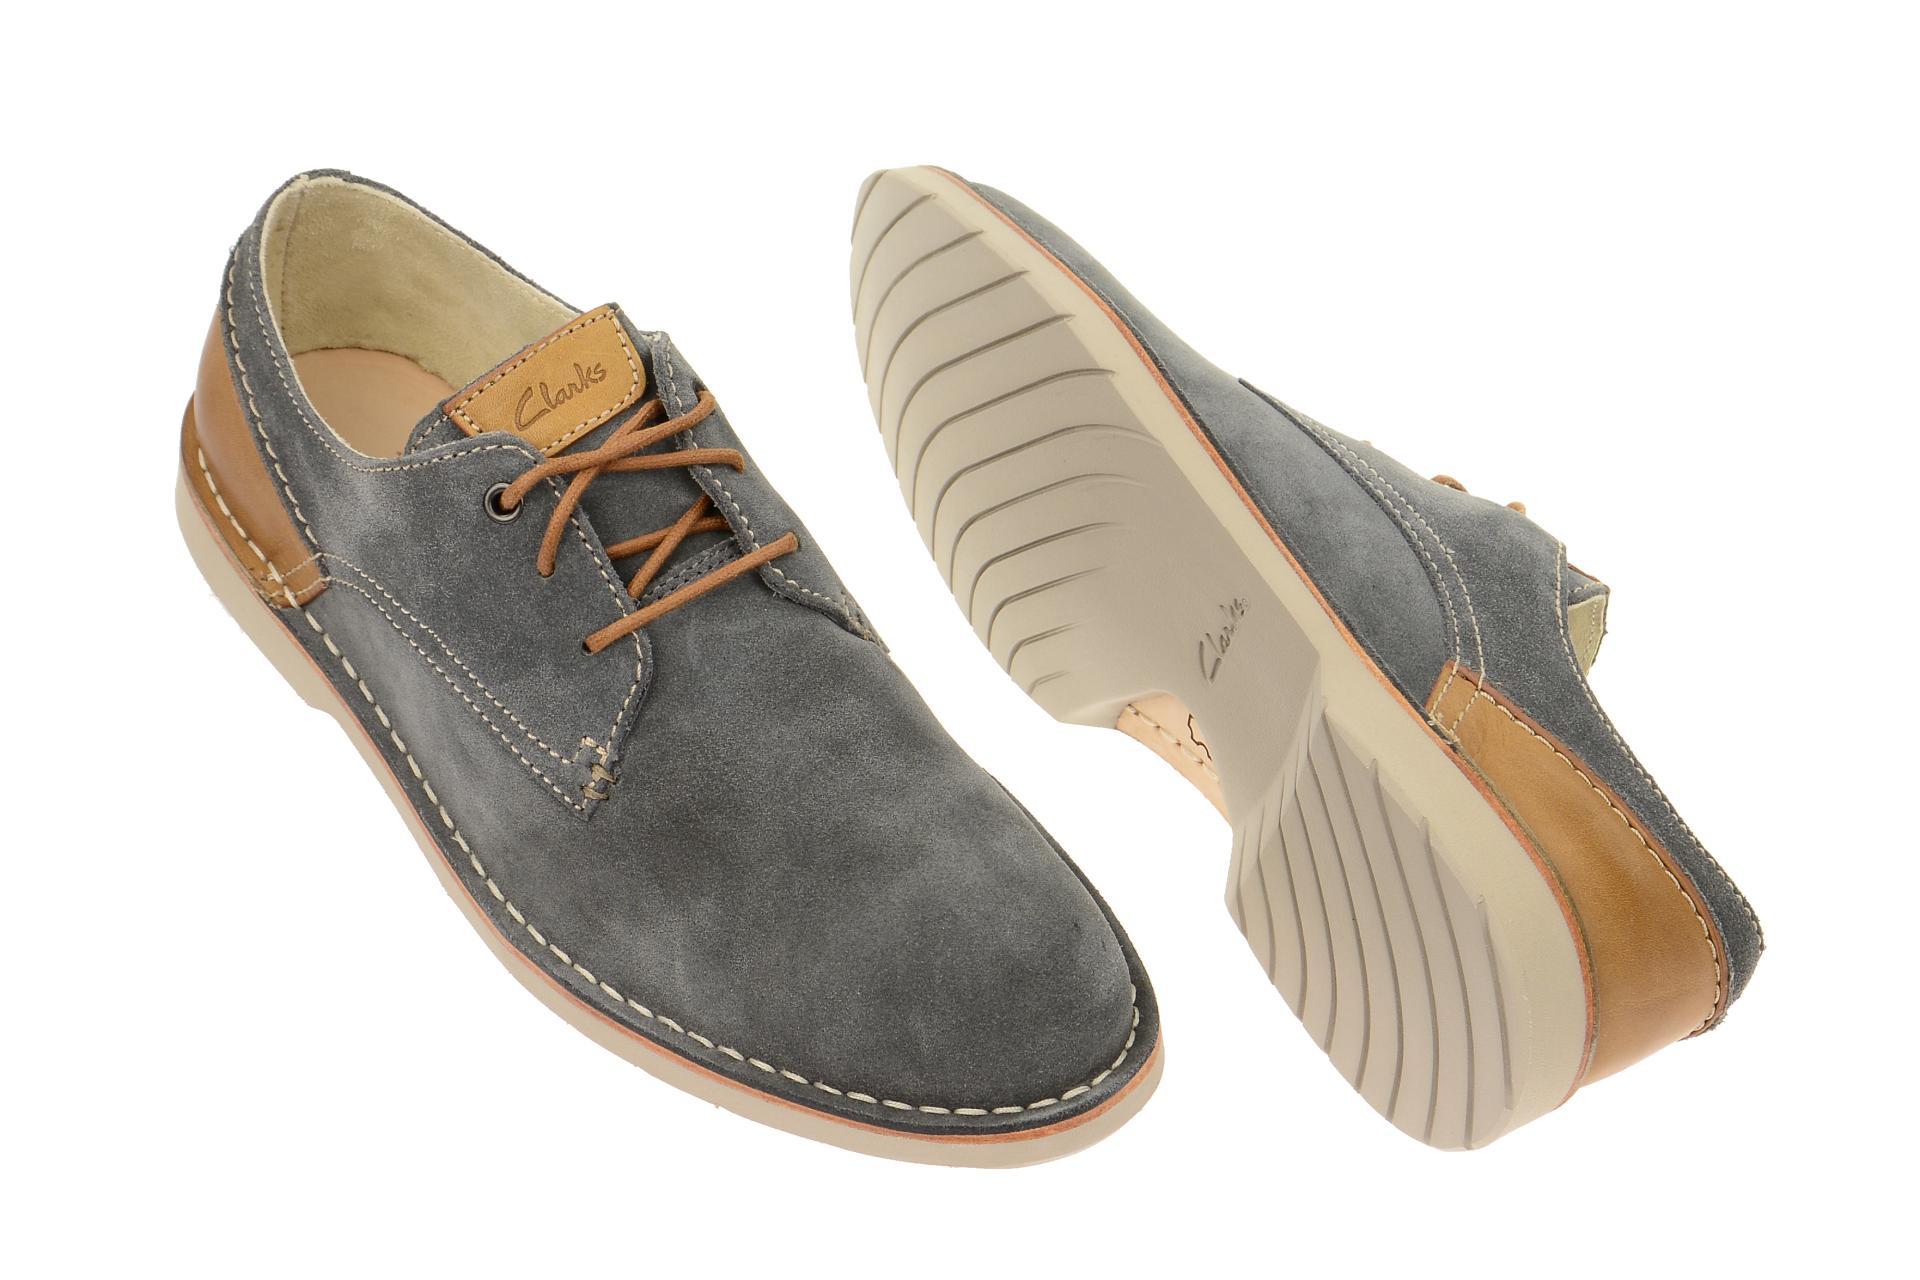 9be2d4a3c138 Details zu Clarks Schuhe Hinton Fly blau blau Herrenschuhe elegante  Halbschuhe 26107319